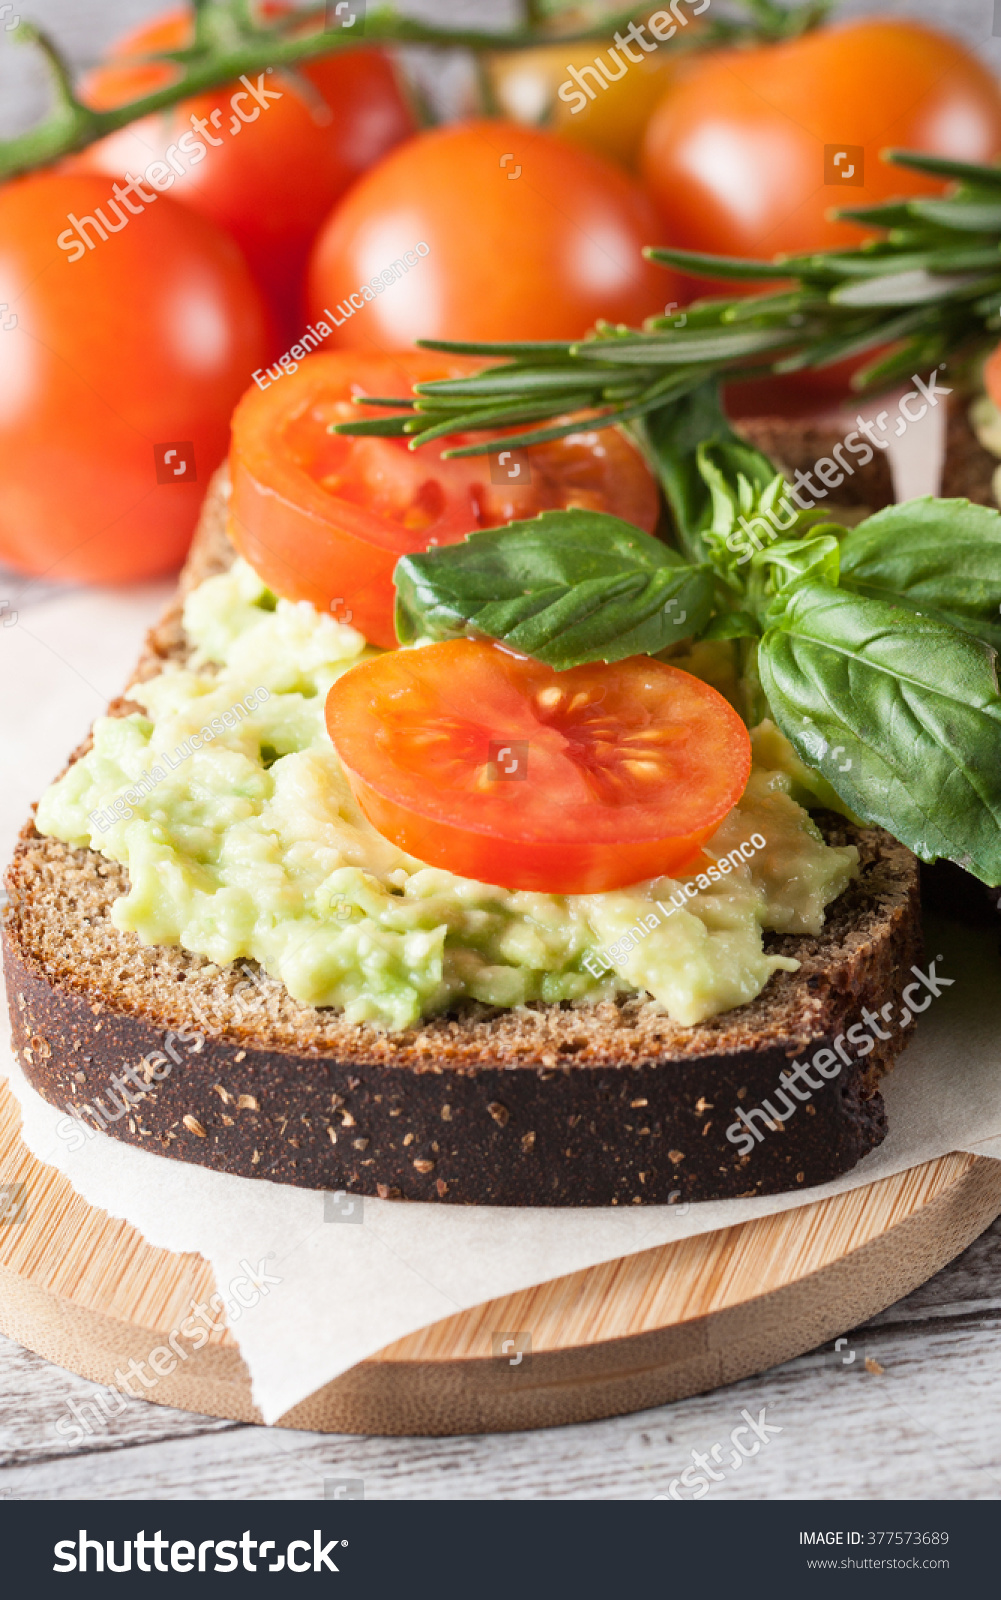 avocado toast cherry tomato on wooden stock photo 377573689 shutterstock. Black Bedroom Furniture Sets. Home Design Ideas